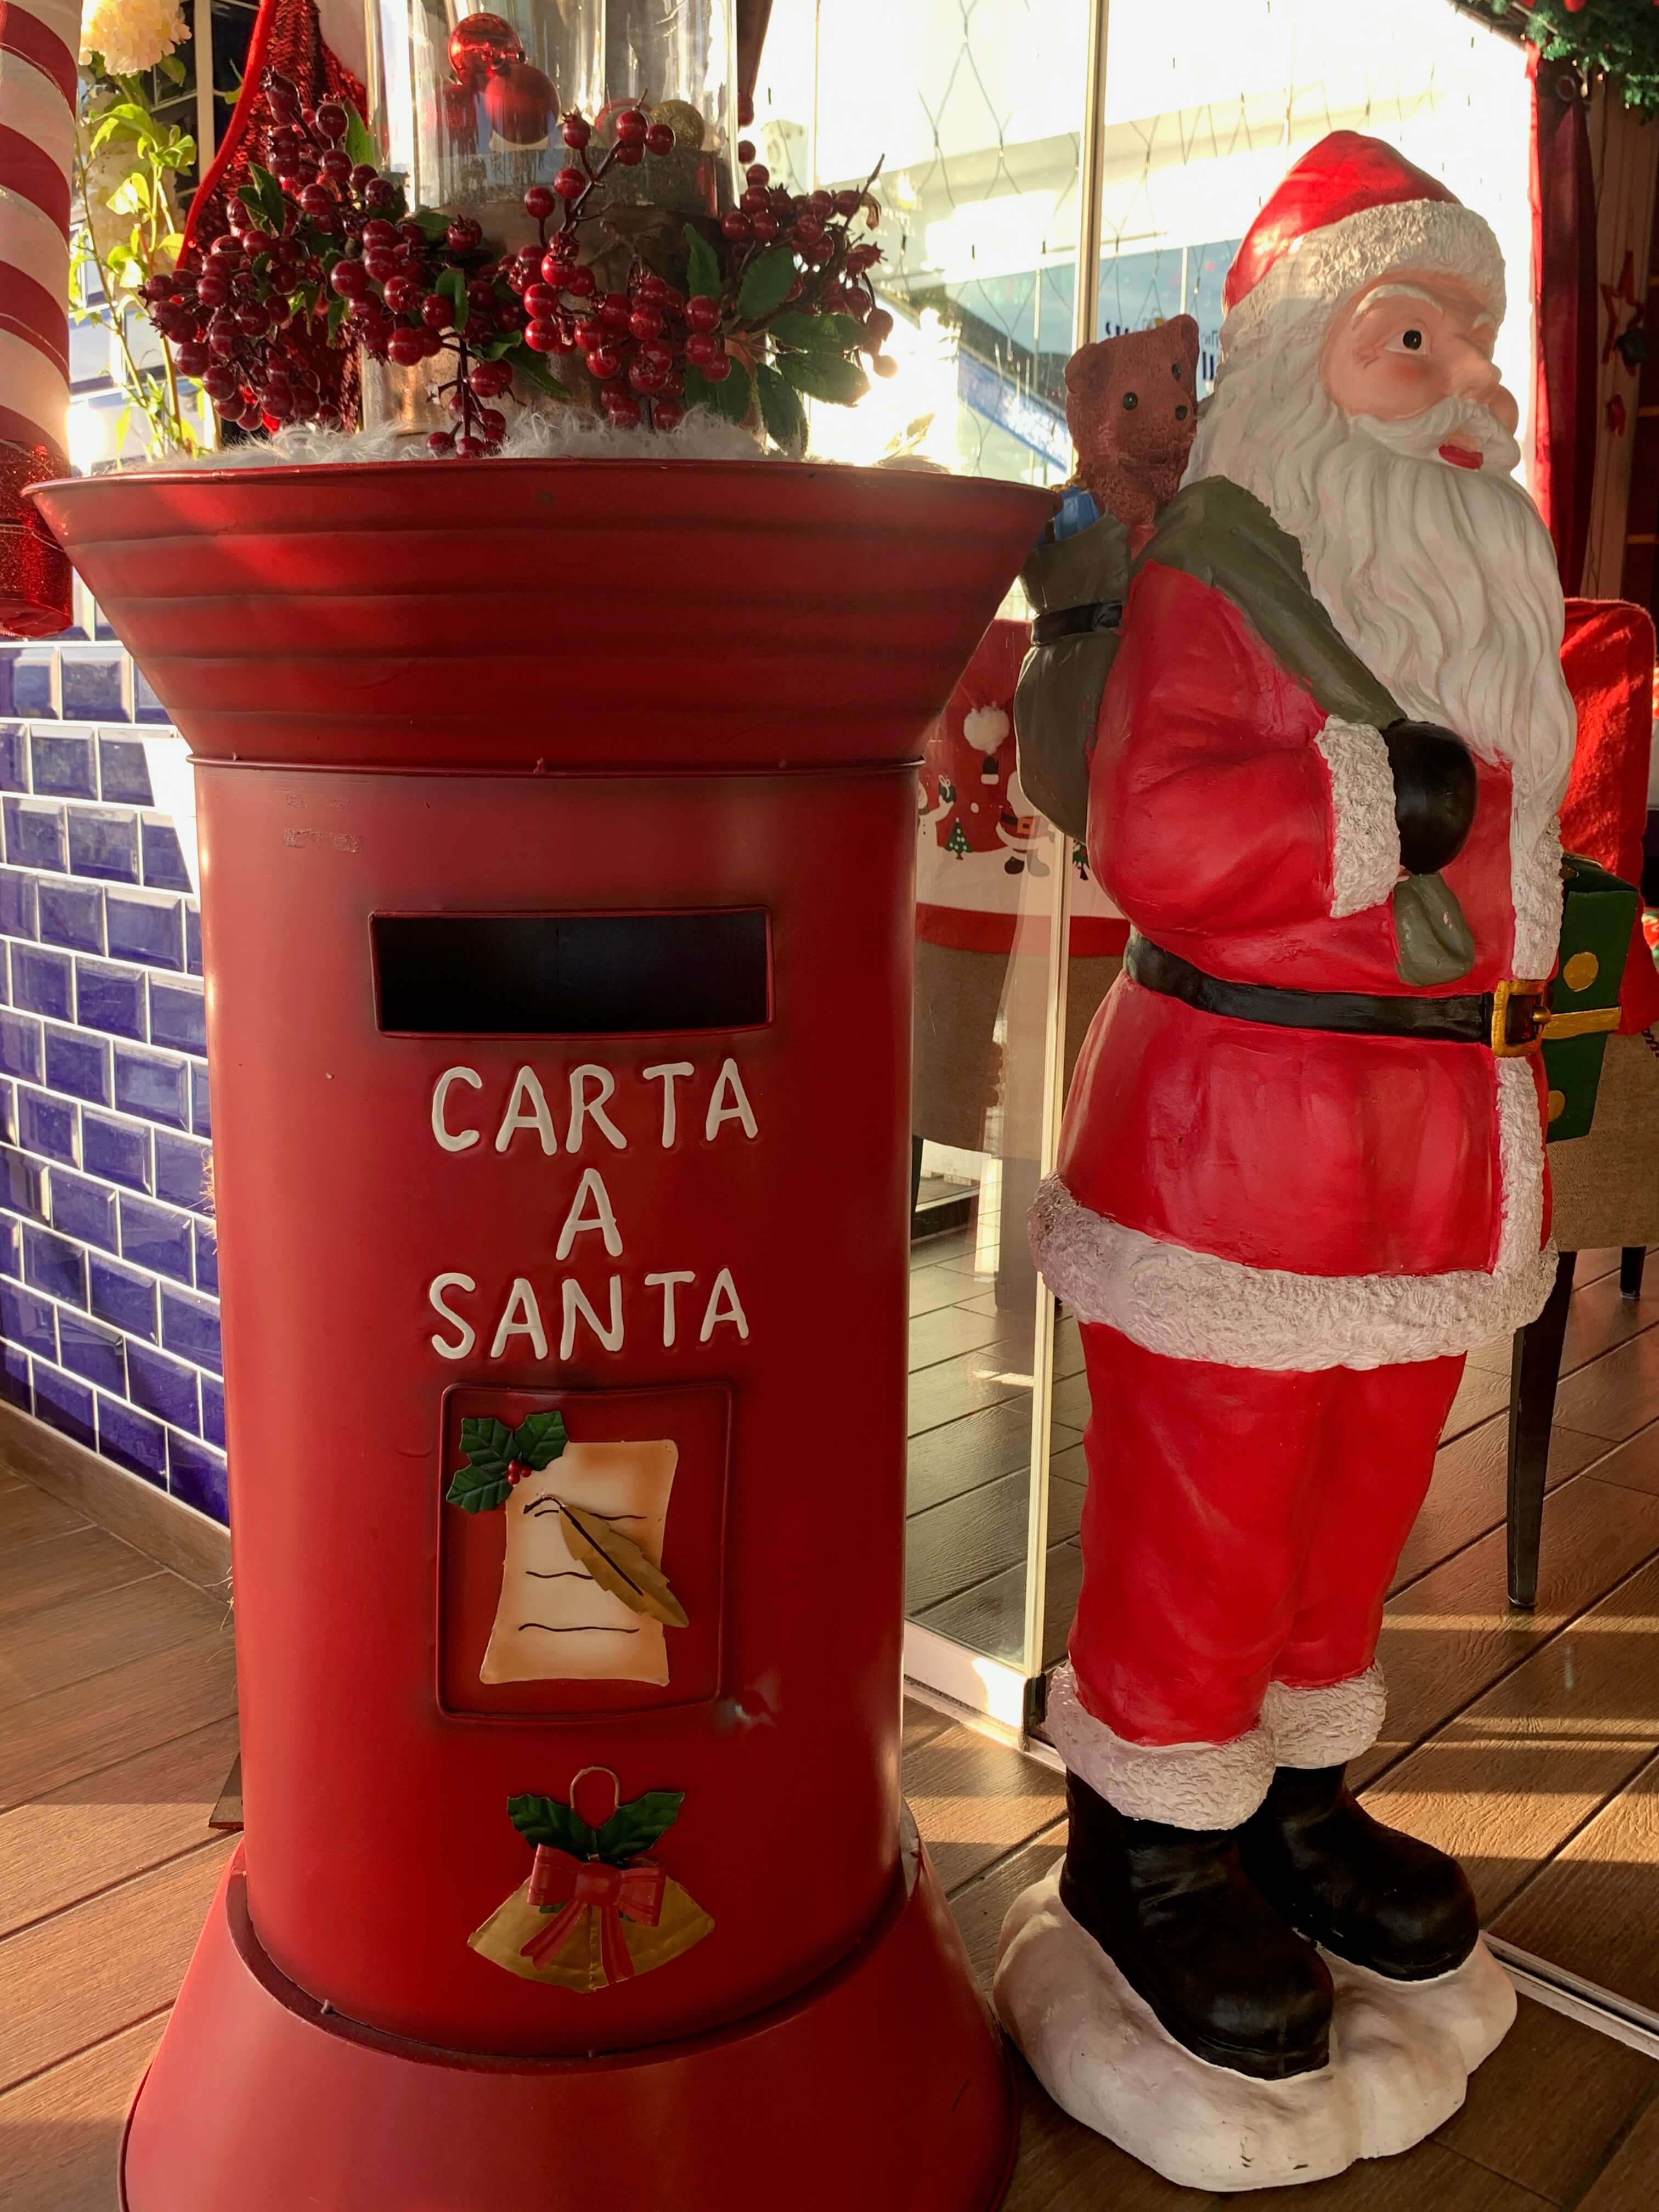 Christmas in Spain - Santa Claus